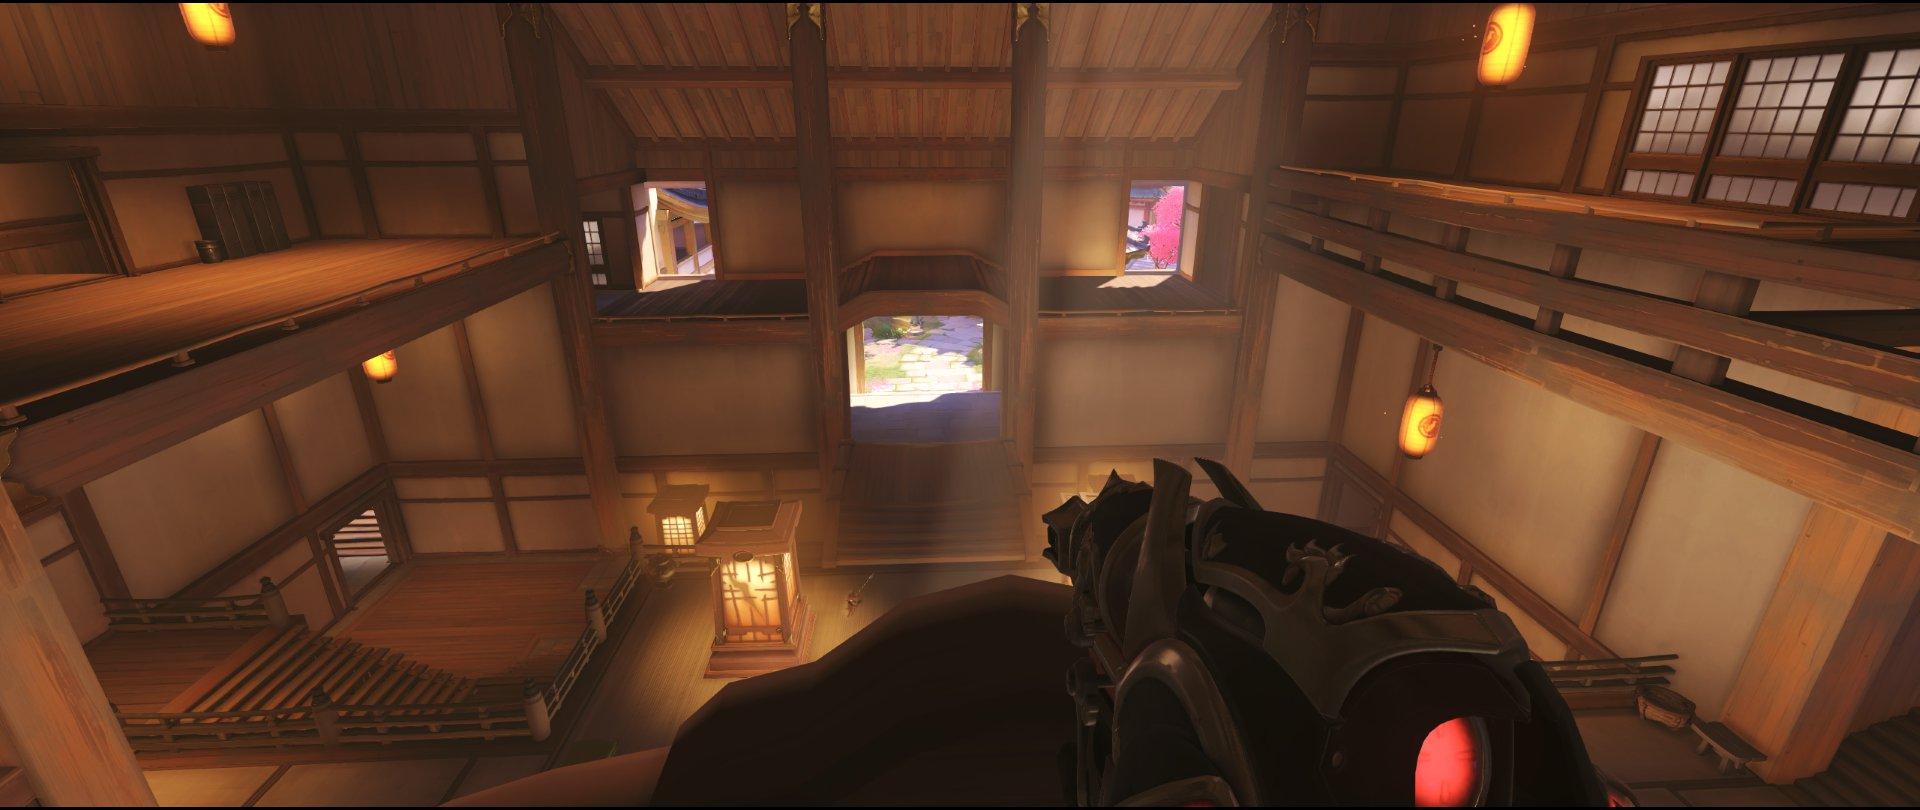 Roof defense Widowmaker sniping spot Hanamura Overwatch.jpg